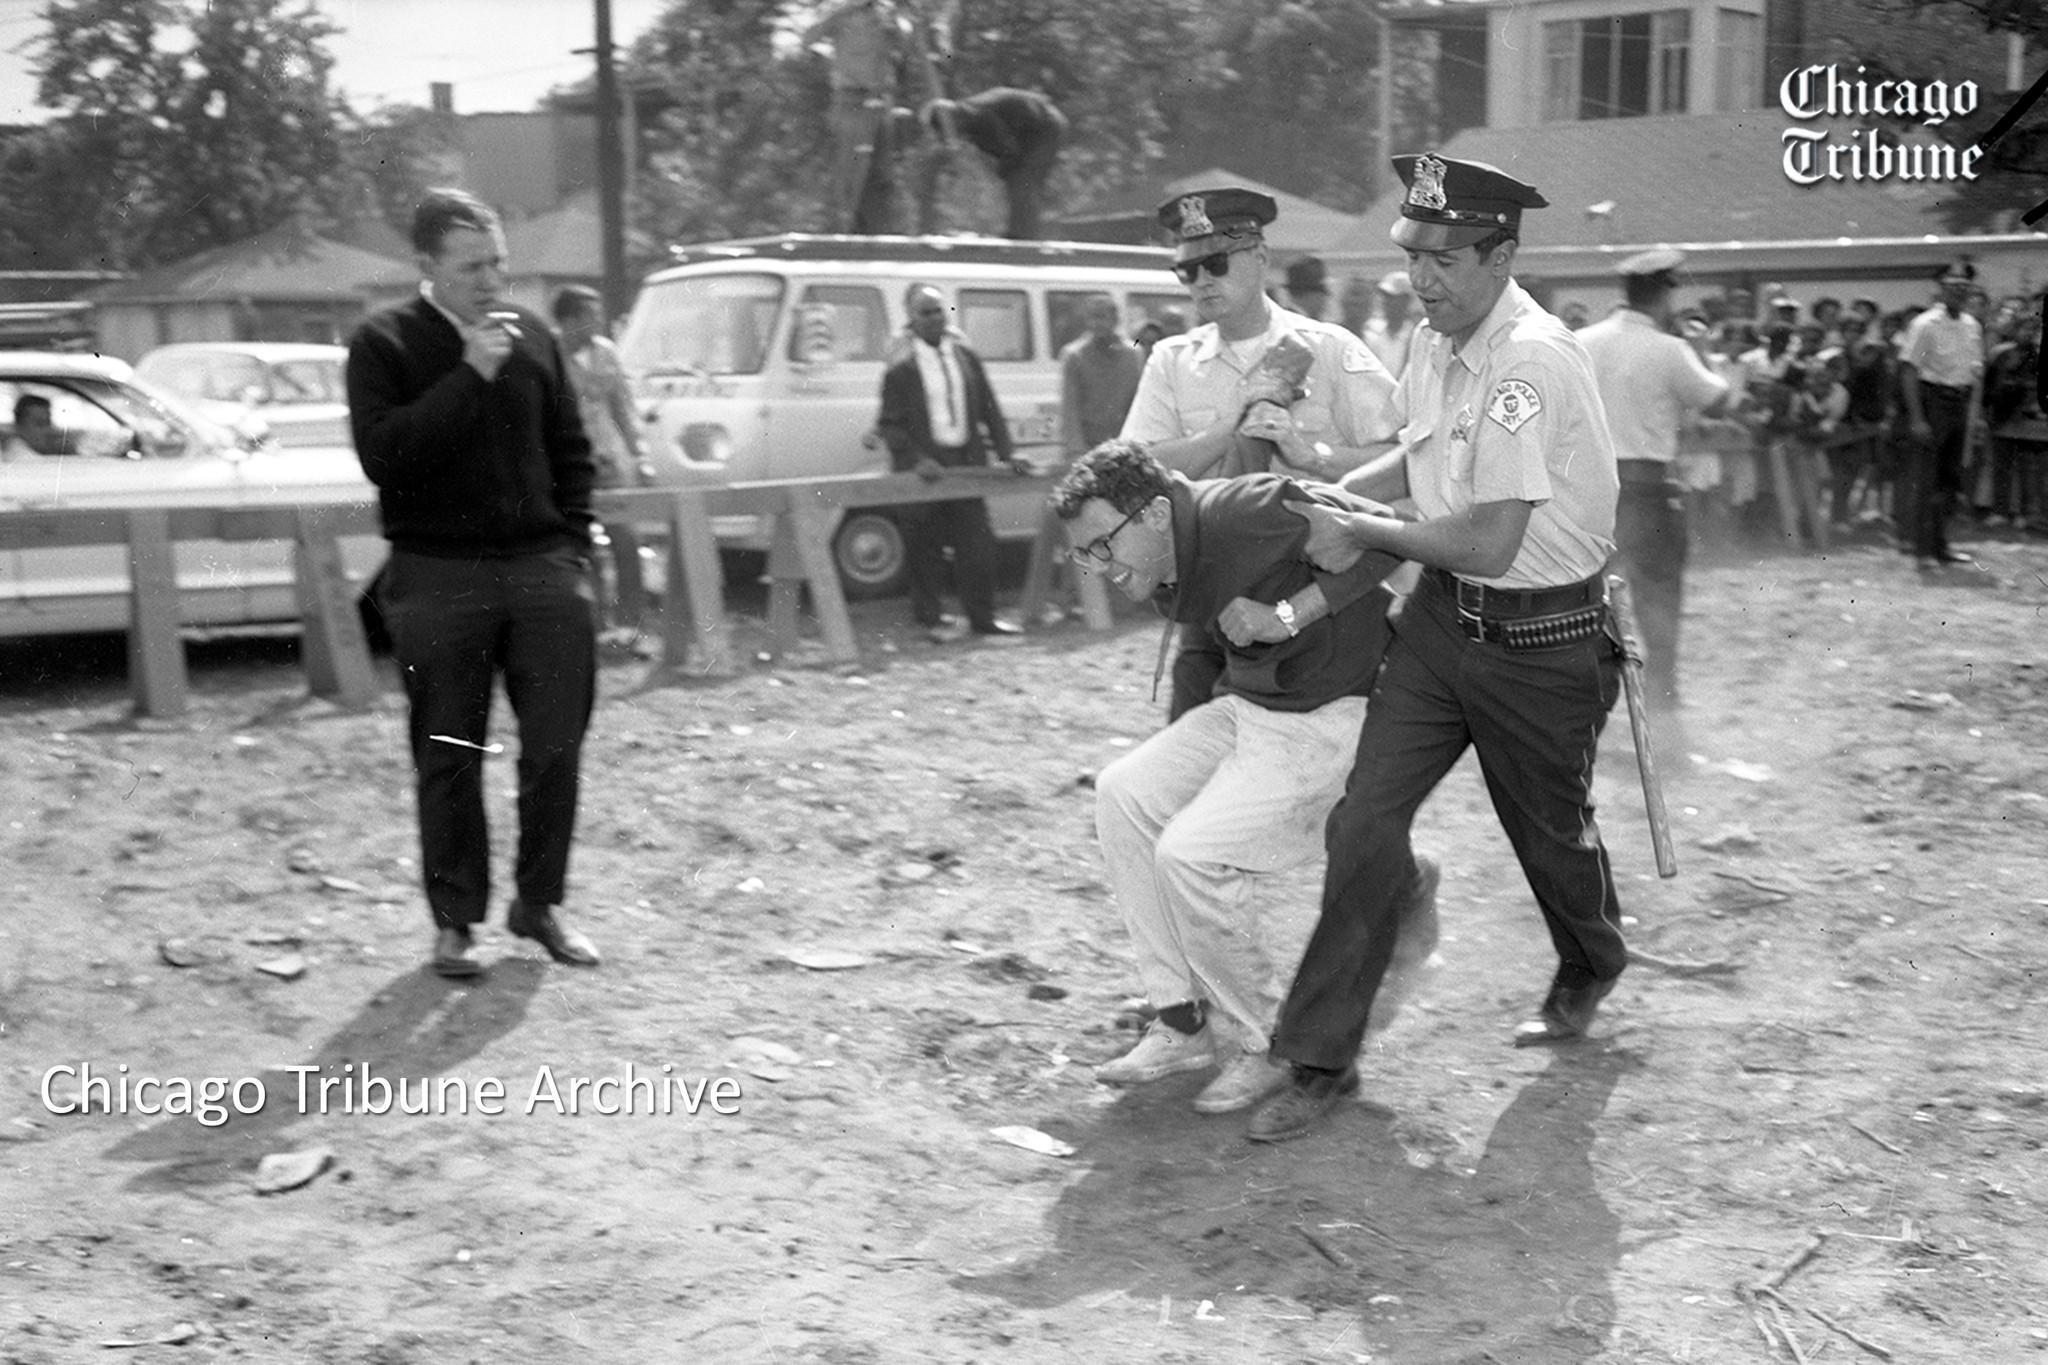 what were willis wagons that got bernie sanders arrested in 1963